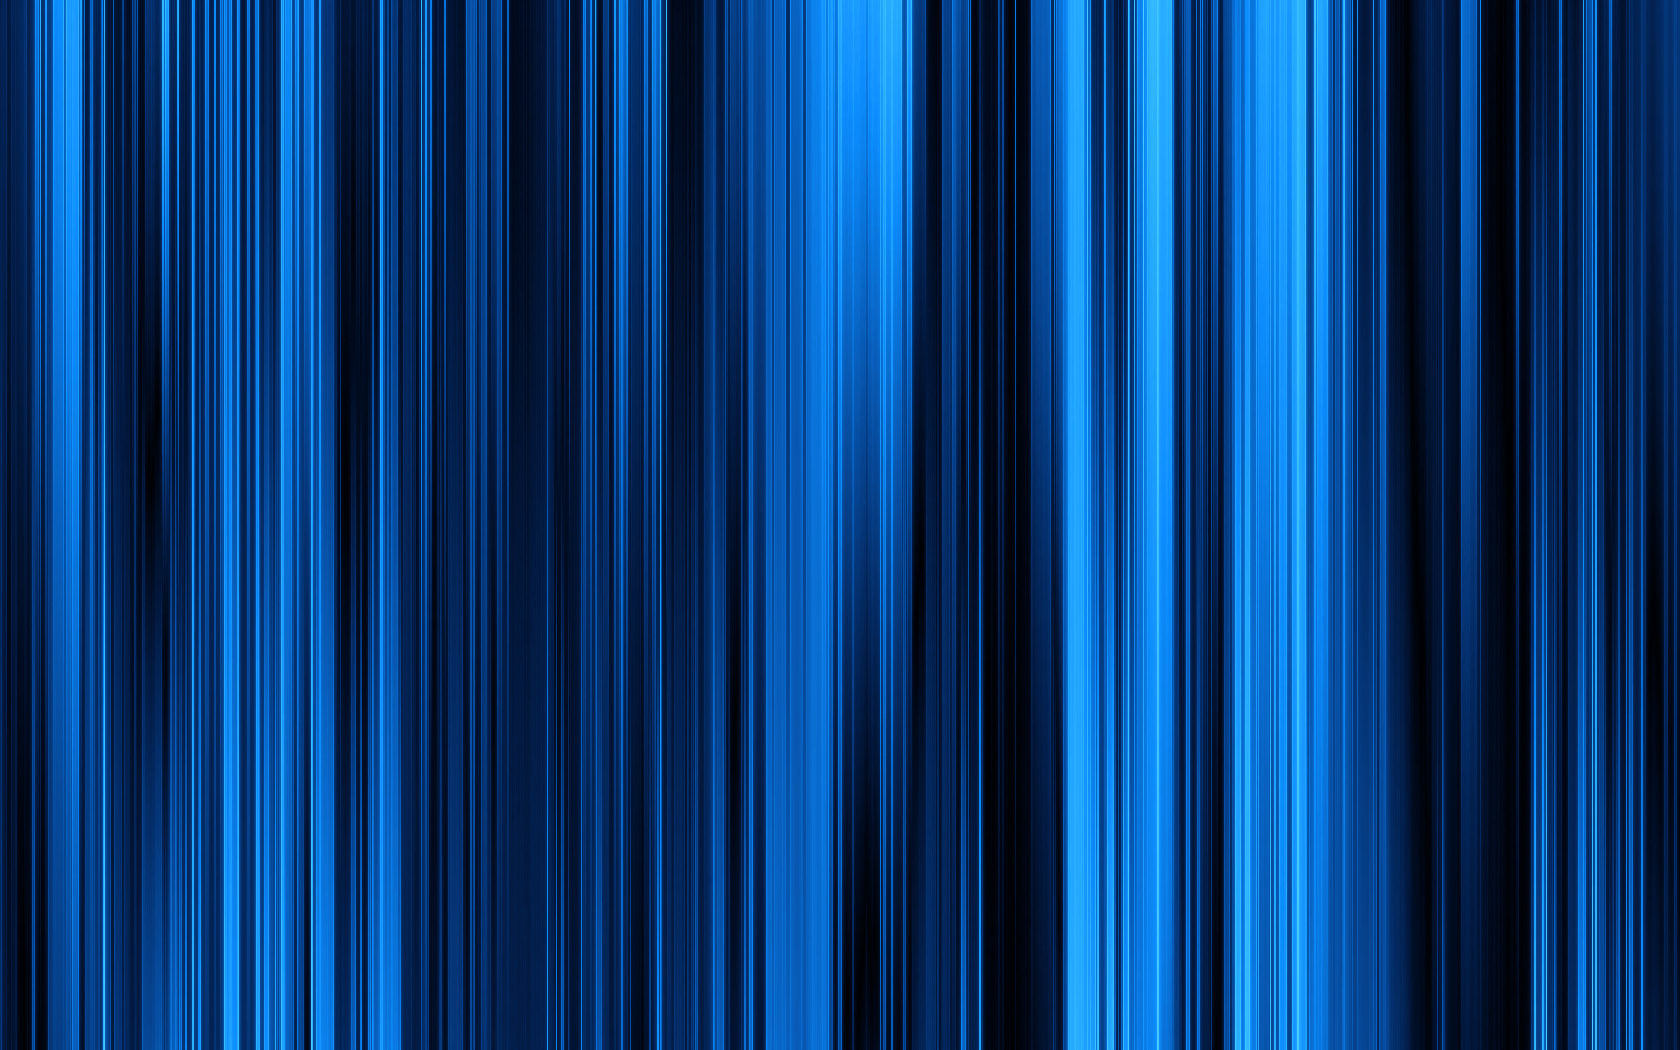 MagiStream The Bestiary - Striped Arkai